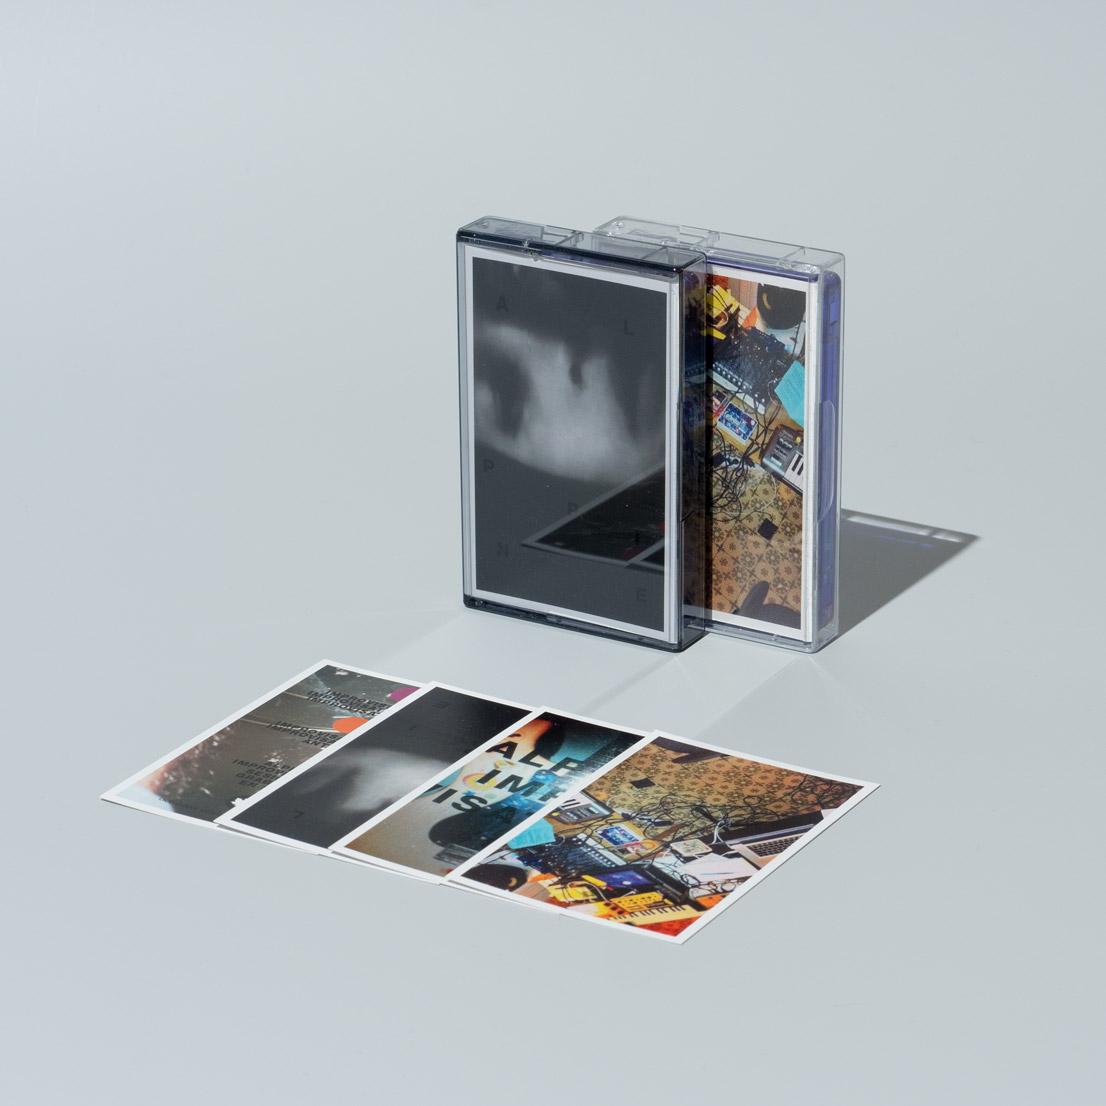 Alppine - Improvisations – Limited Edition Cassette